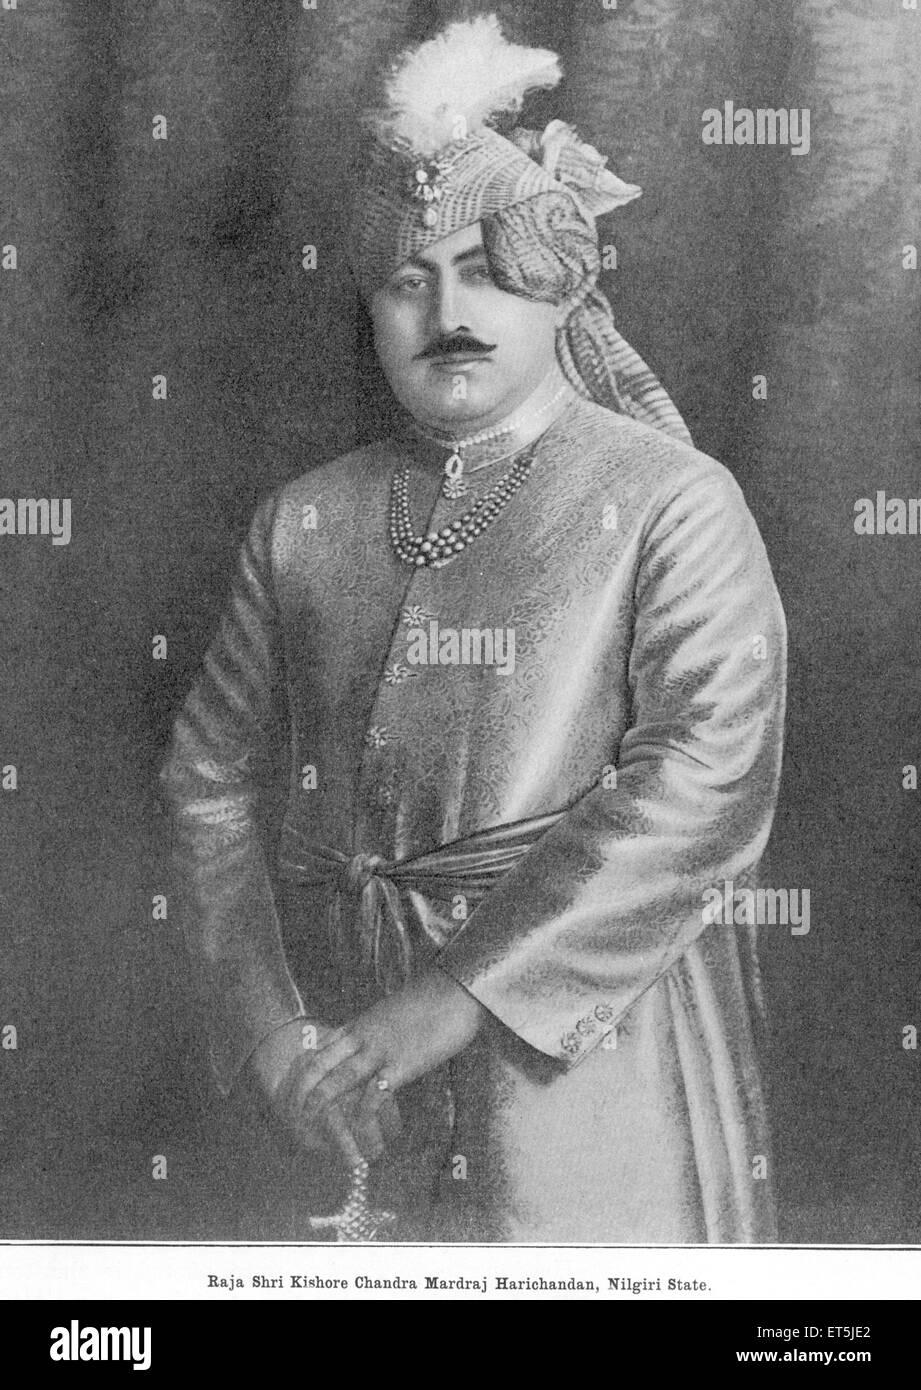 Princes of India Raja Shri Kishore Chandra Mardraj Harichandan Nilgiri State ; Tamil Nadu ; India NO MR - Stock Image